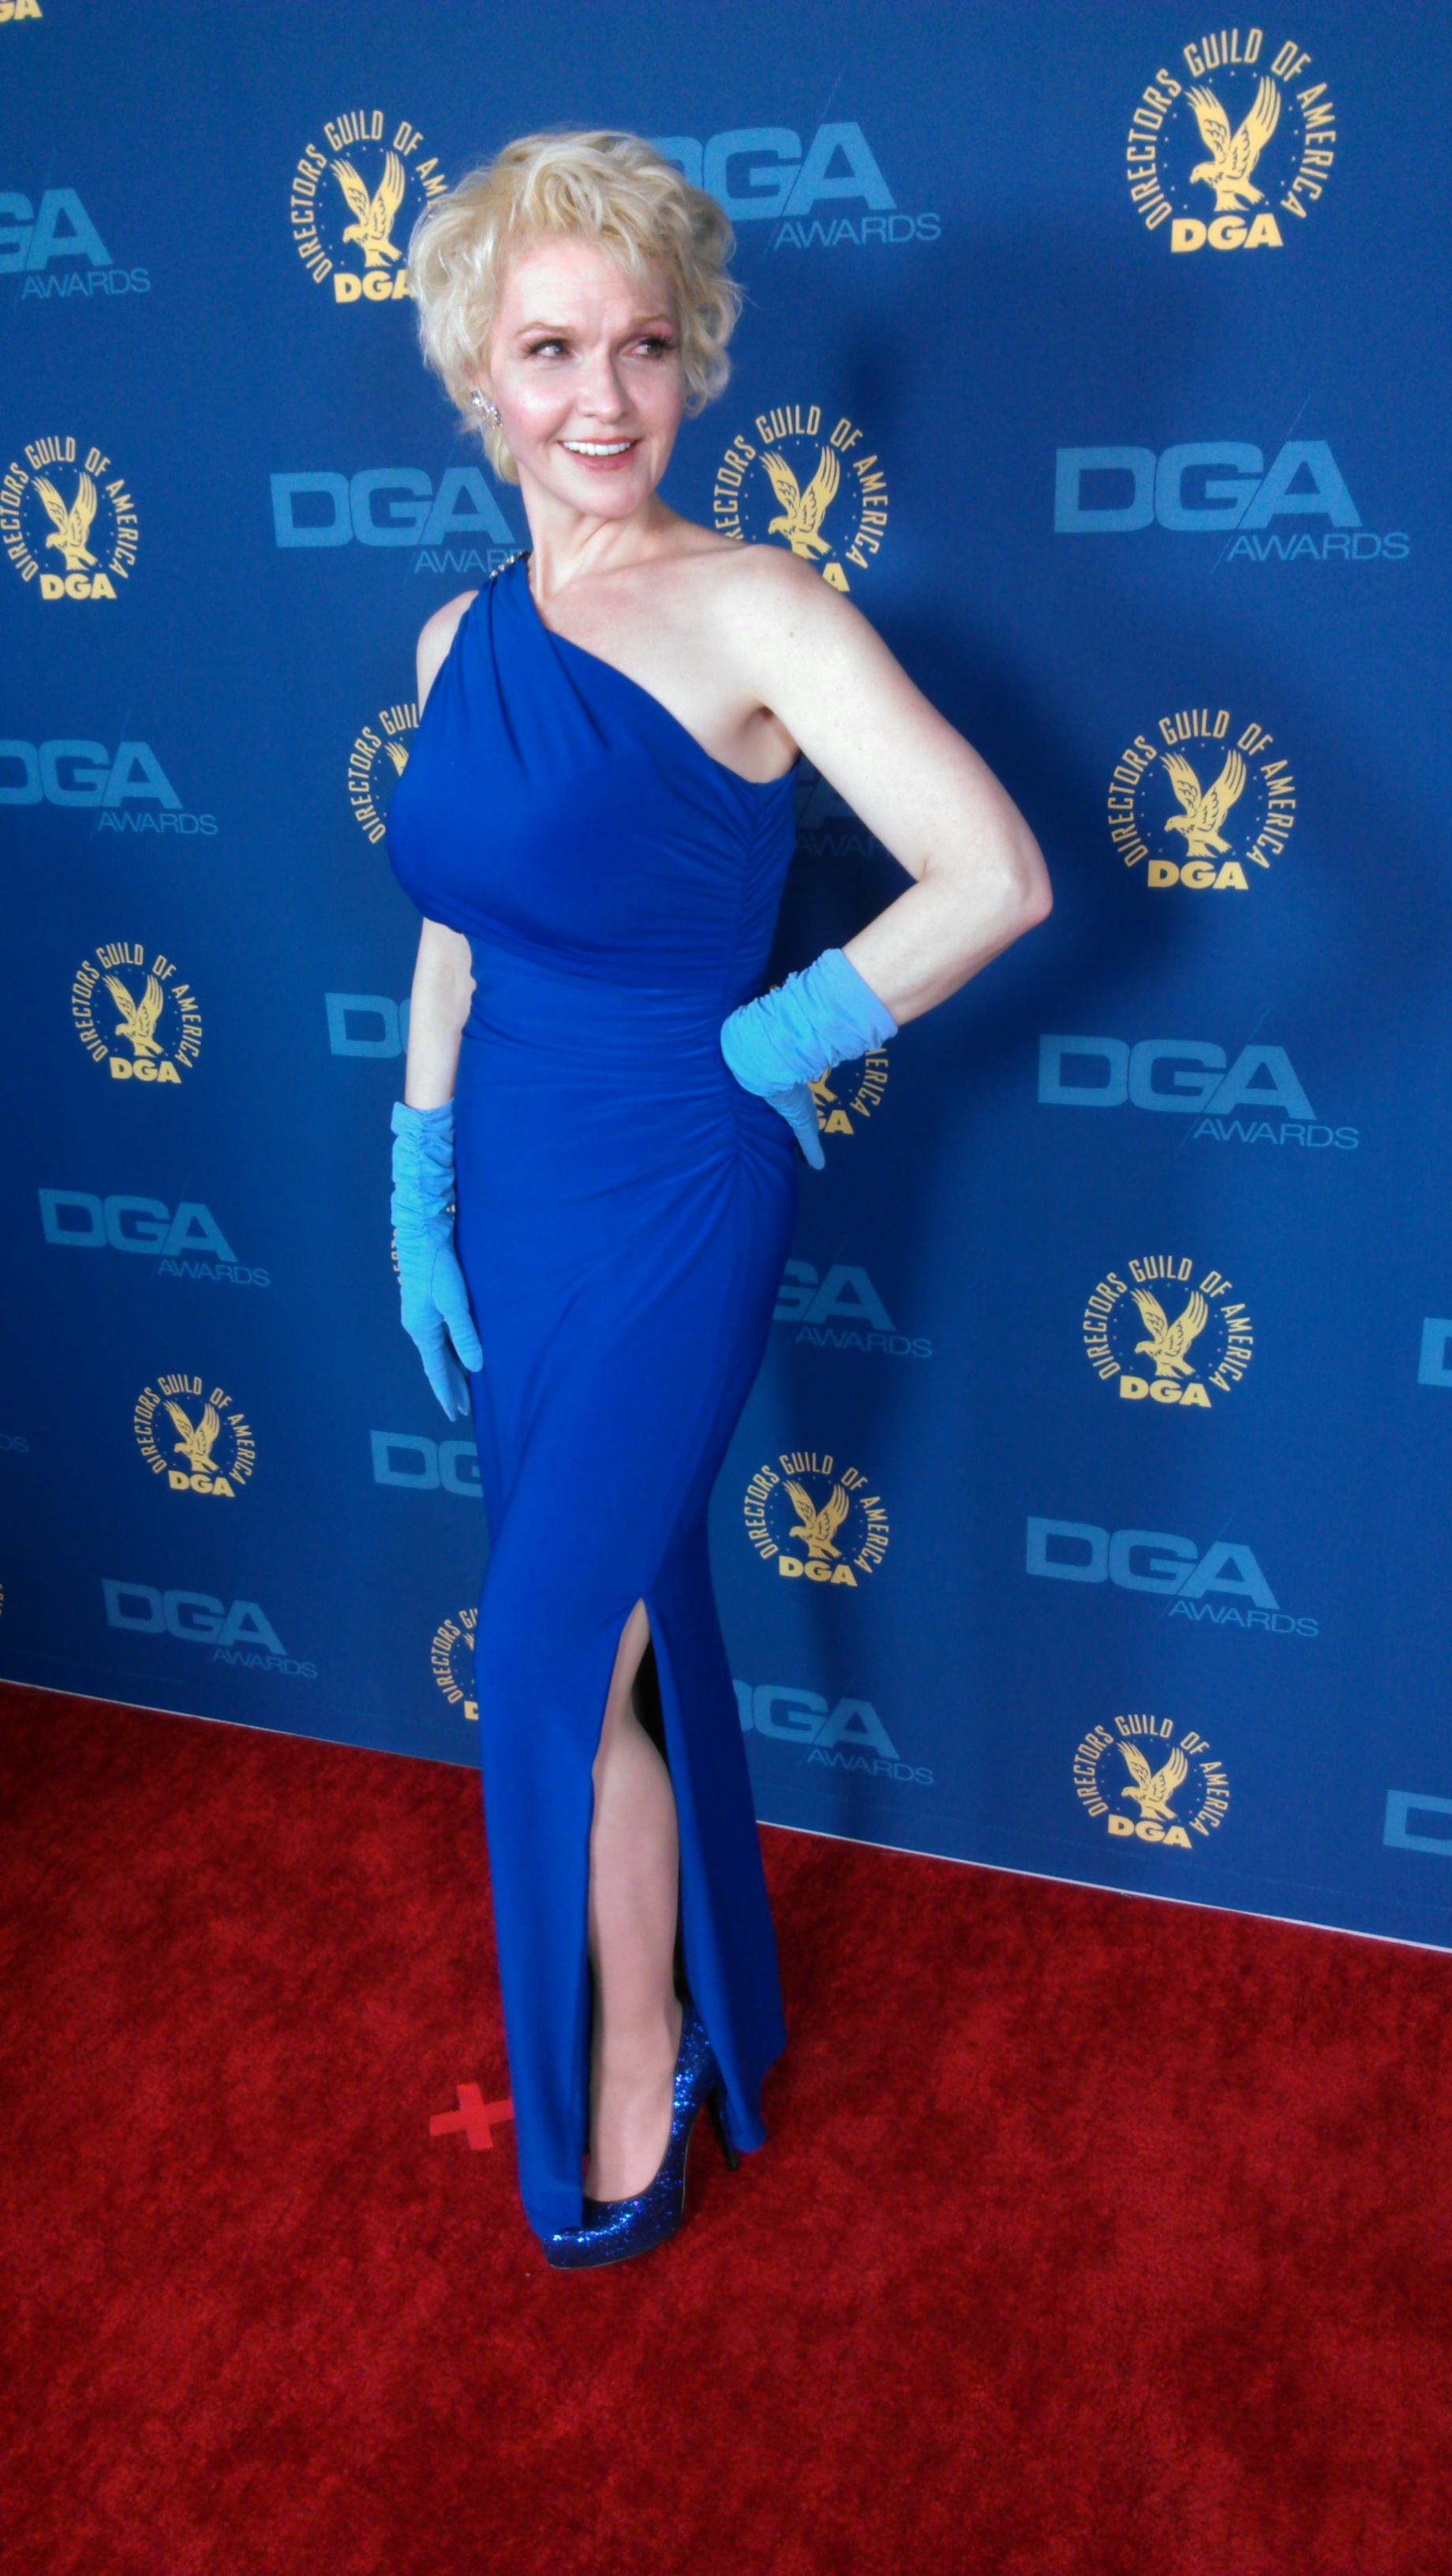 Dee at DGA Awards 2013.jpg